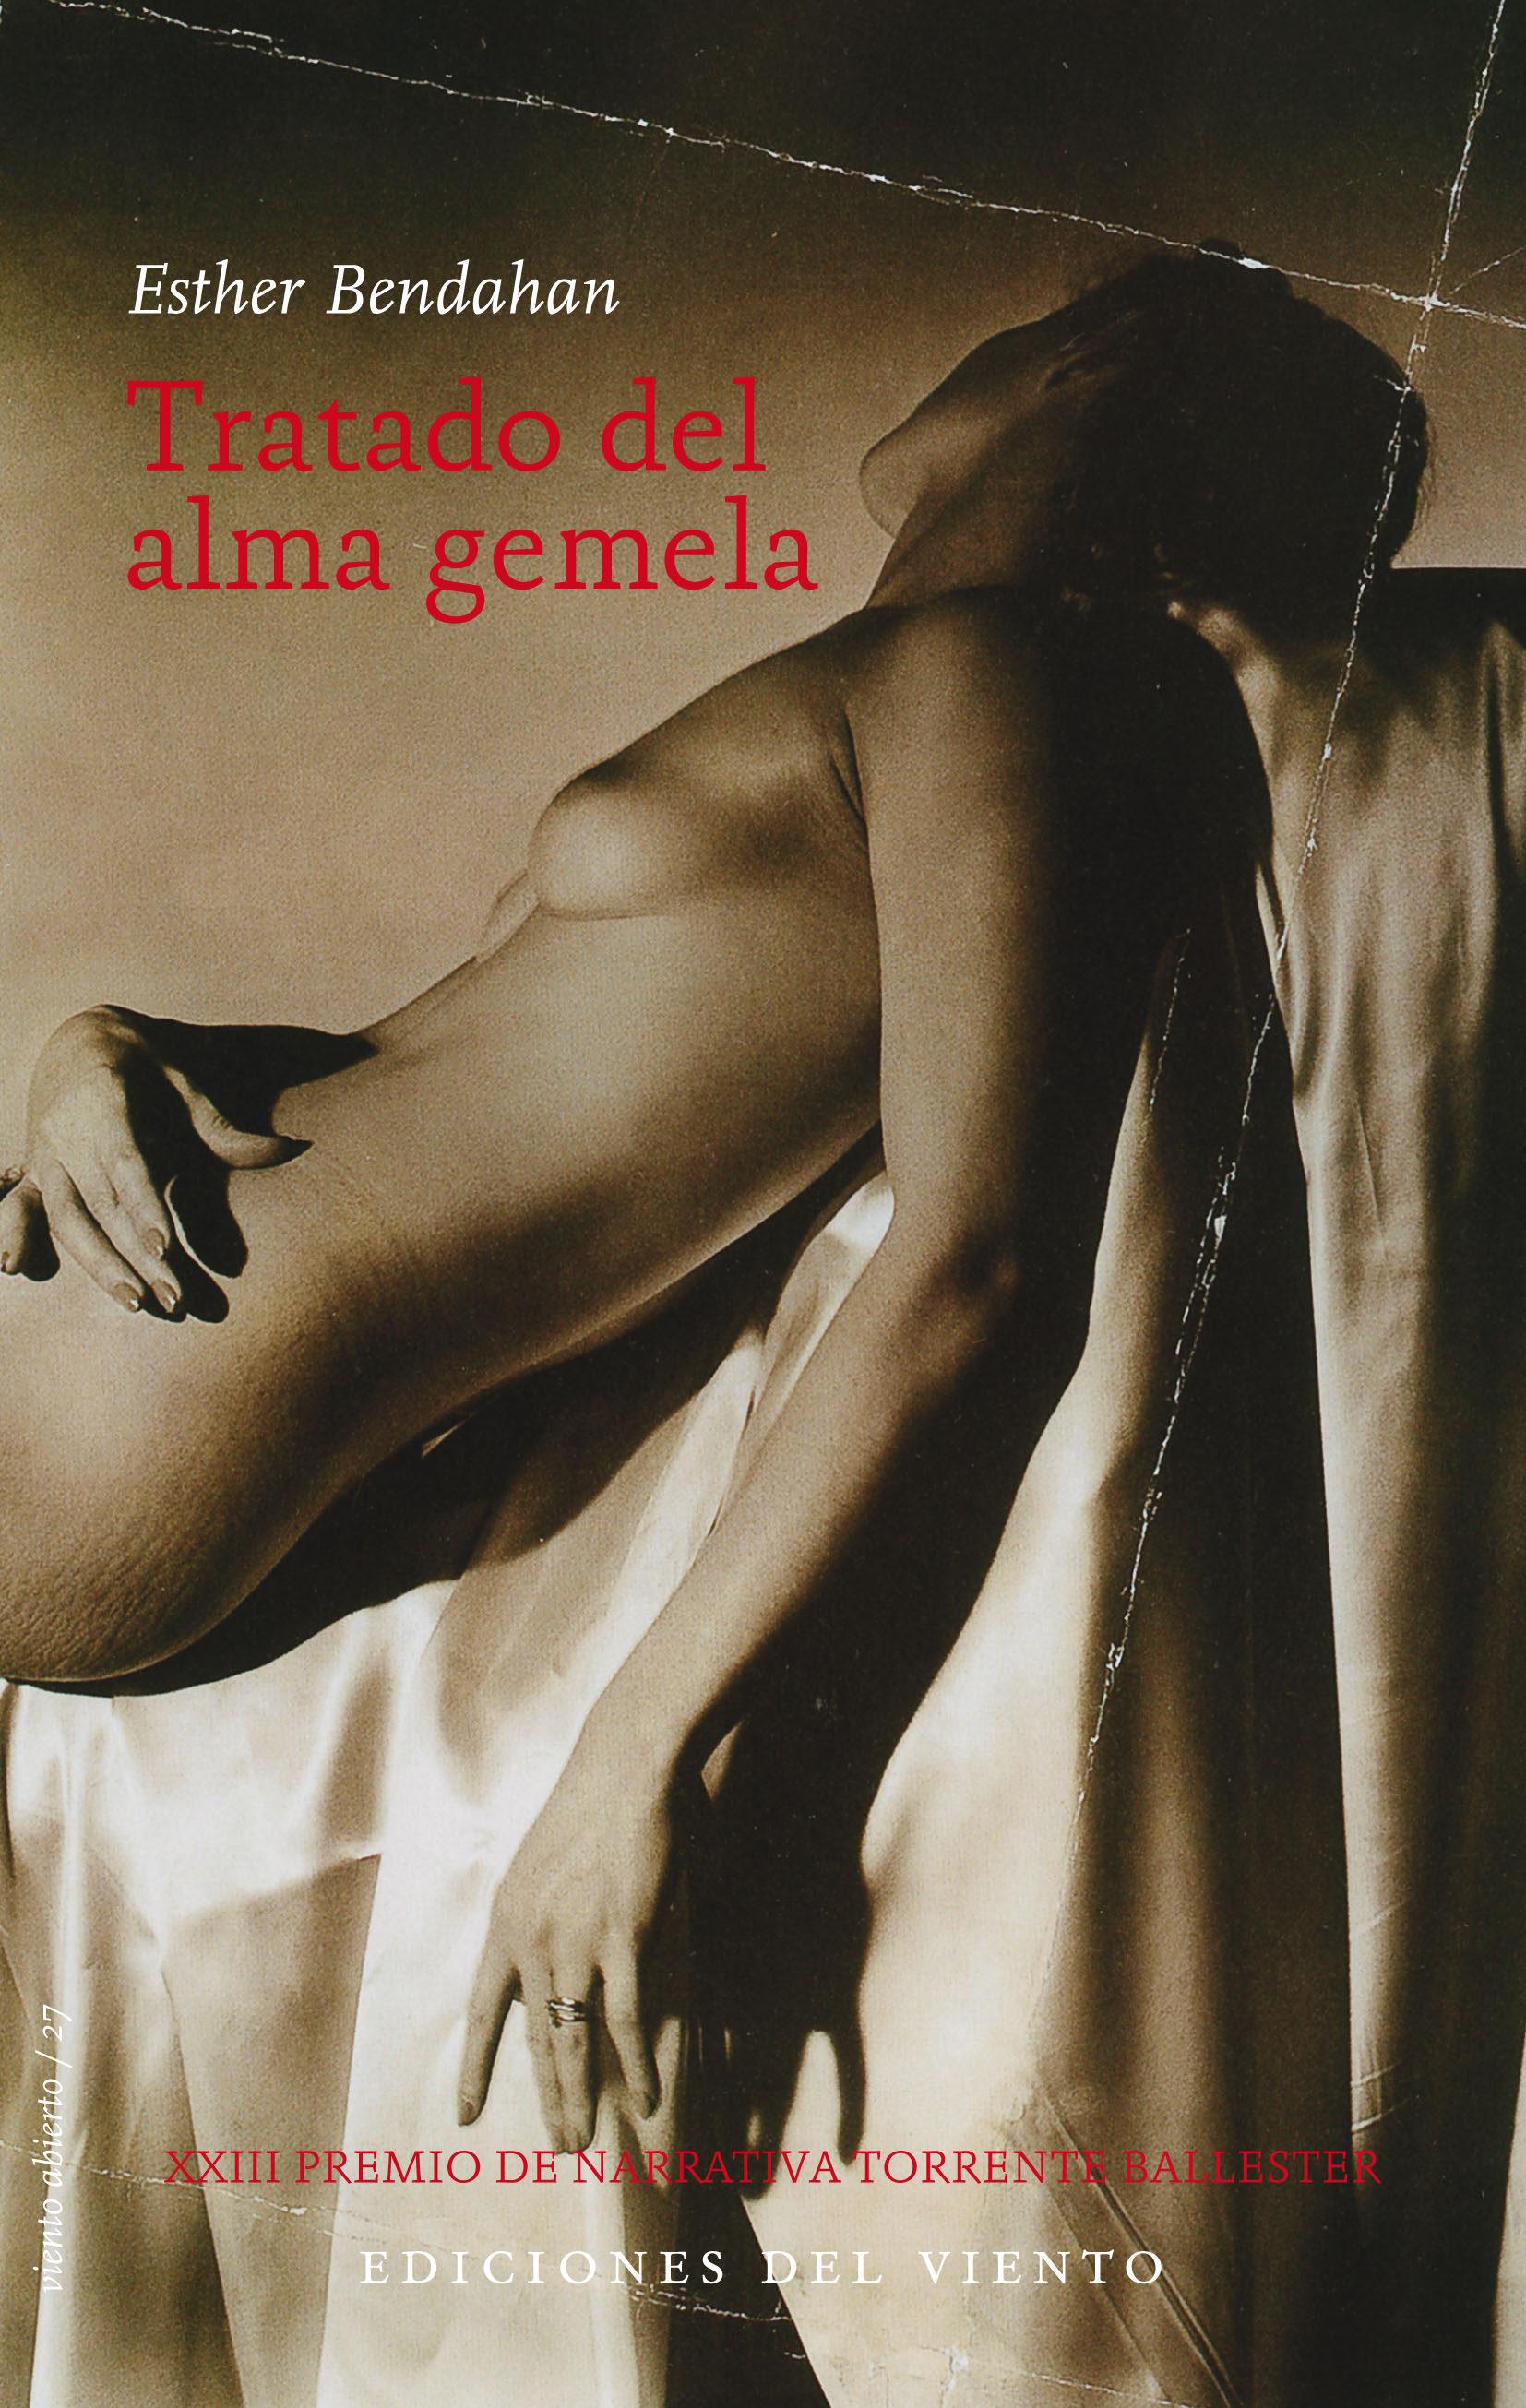 Tratado Del Alma Gemela (xxiii Premio De Narrativa Torrente Balle Ster) por Esther Bendahan